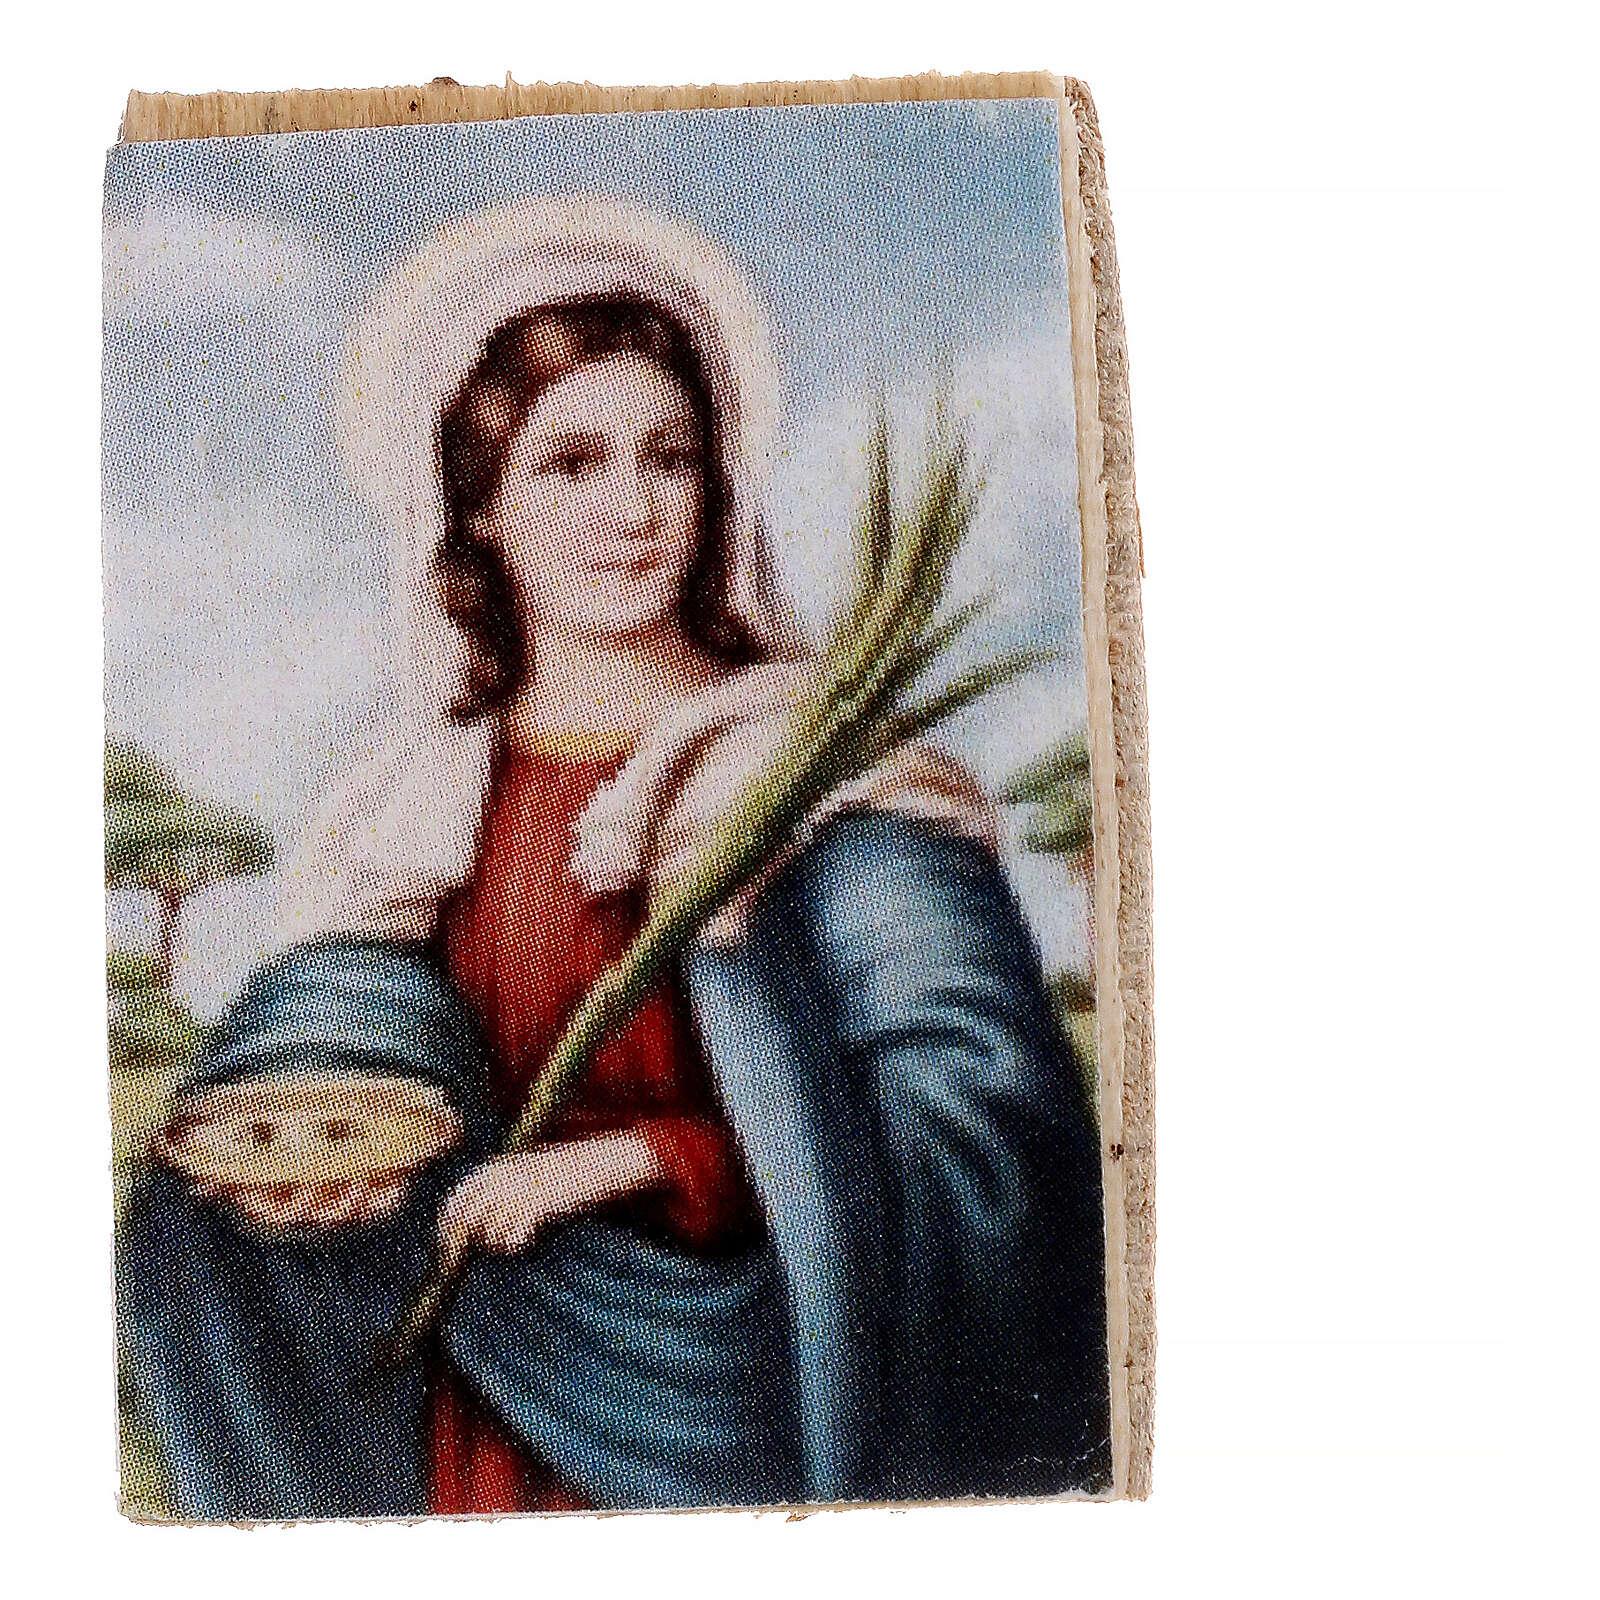 Nativity accessory, wooden picture, 2pcs, 4x3.5cm 4